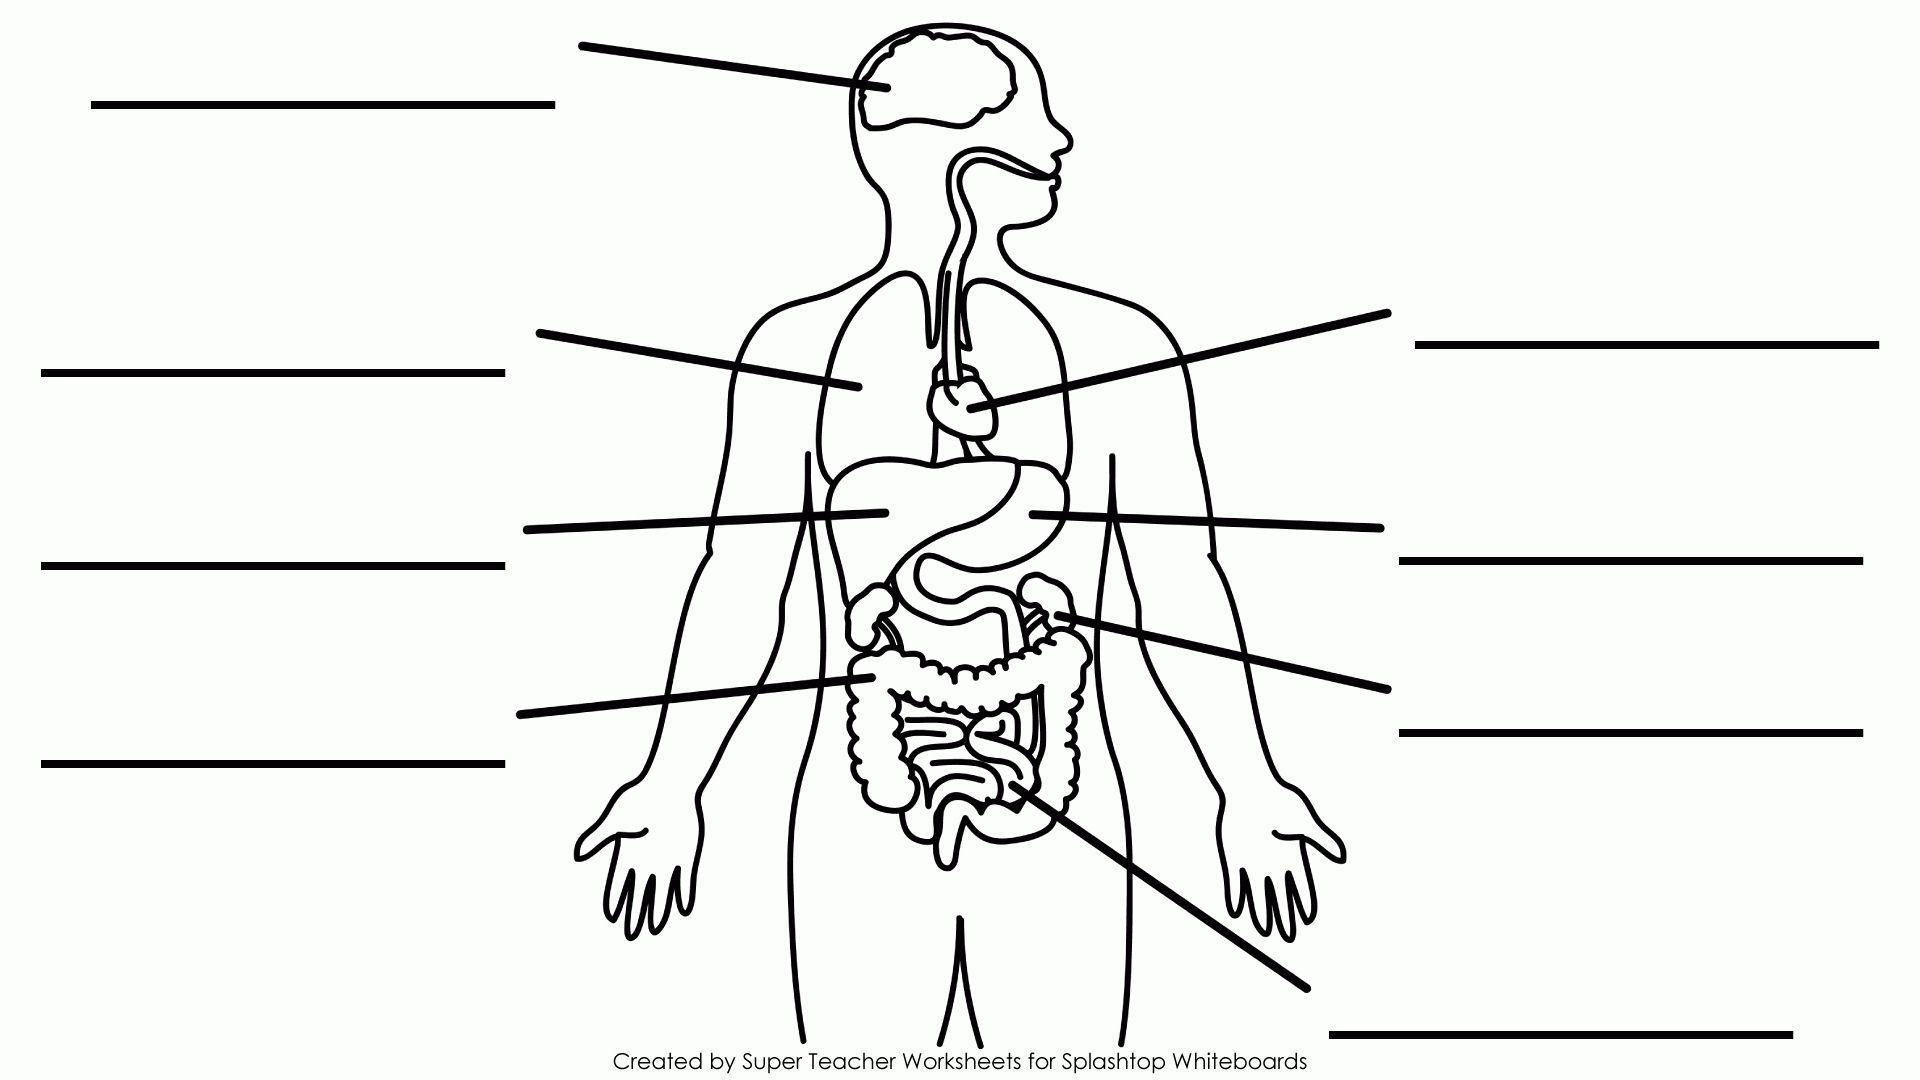 simple body diagram wiring diagram show simple body diagram organs [ 1920 x 1080 Pixel ]